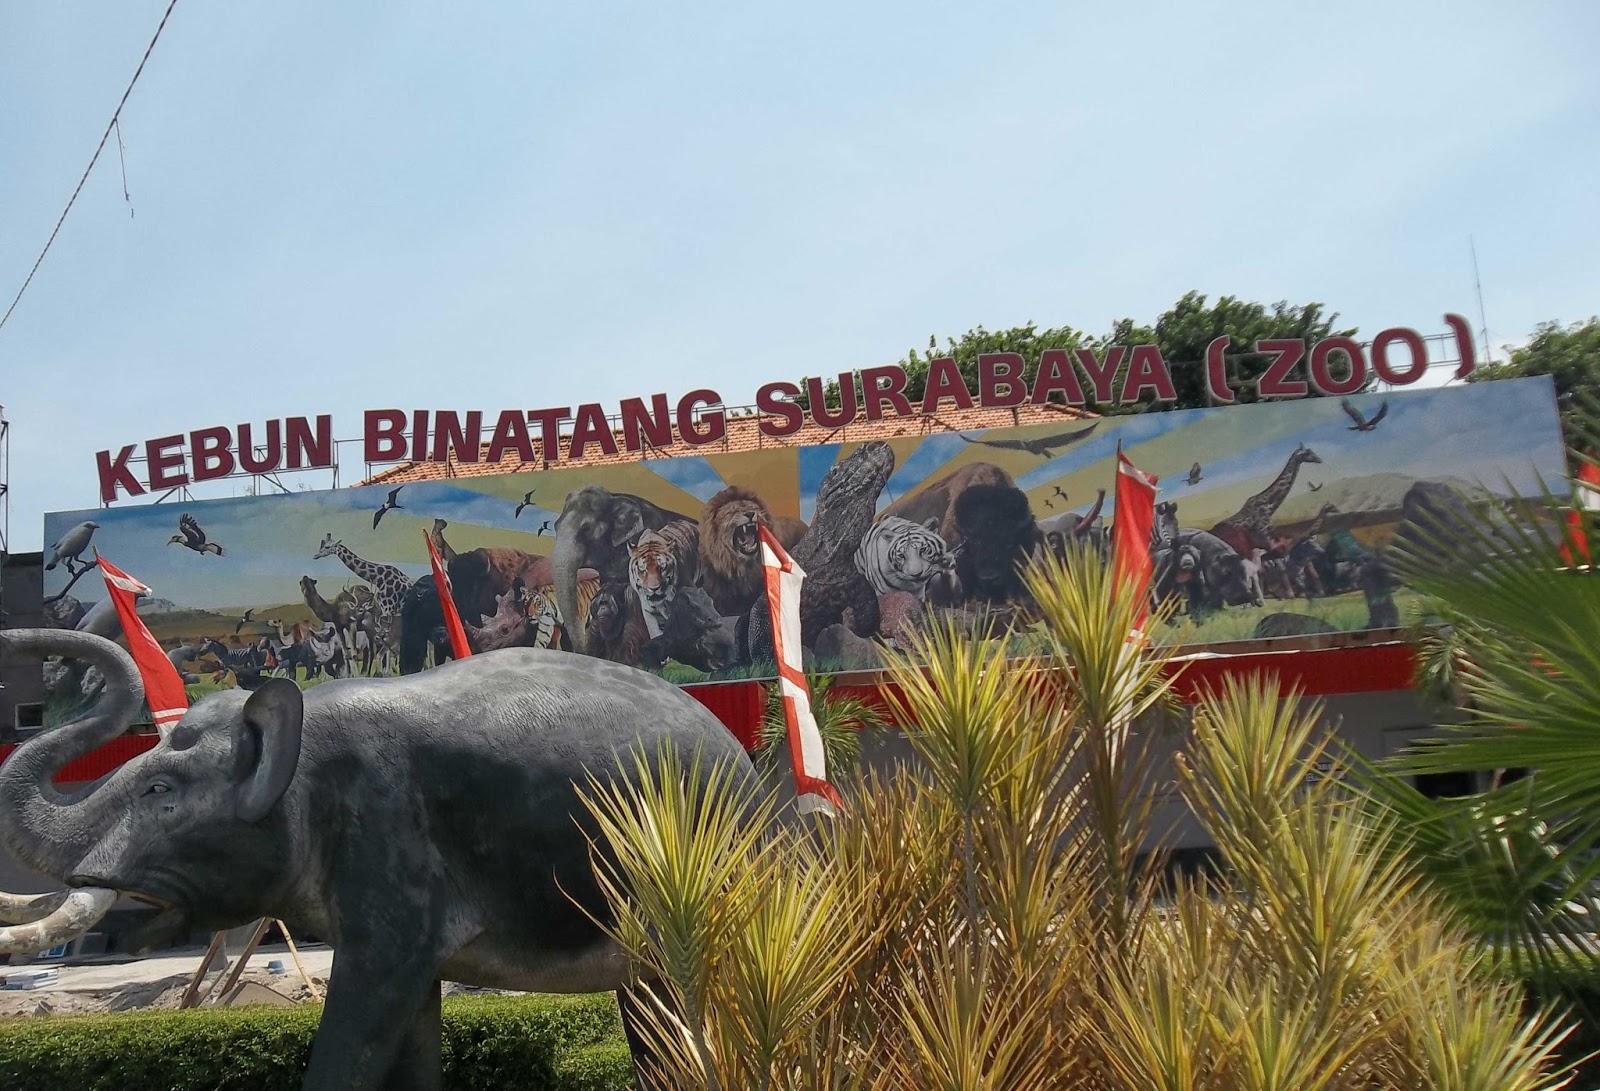 10 Gambar Kebun Binatang Surabaya KBS Harga Tiket Masuk